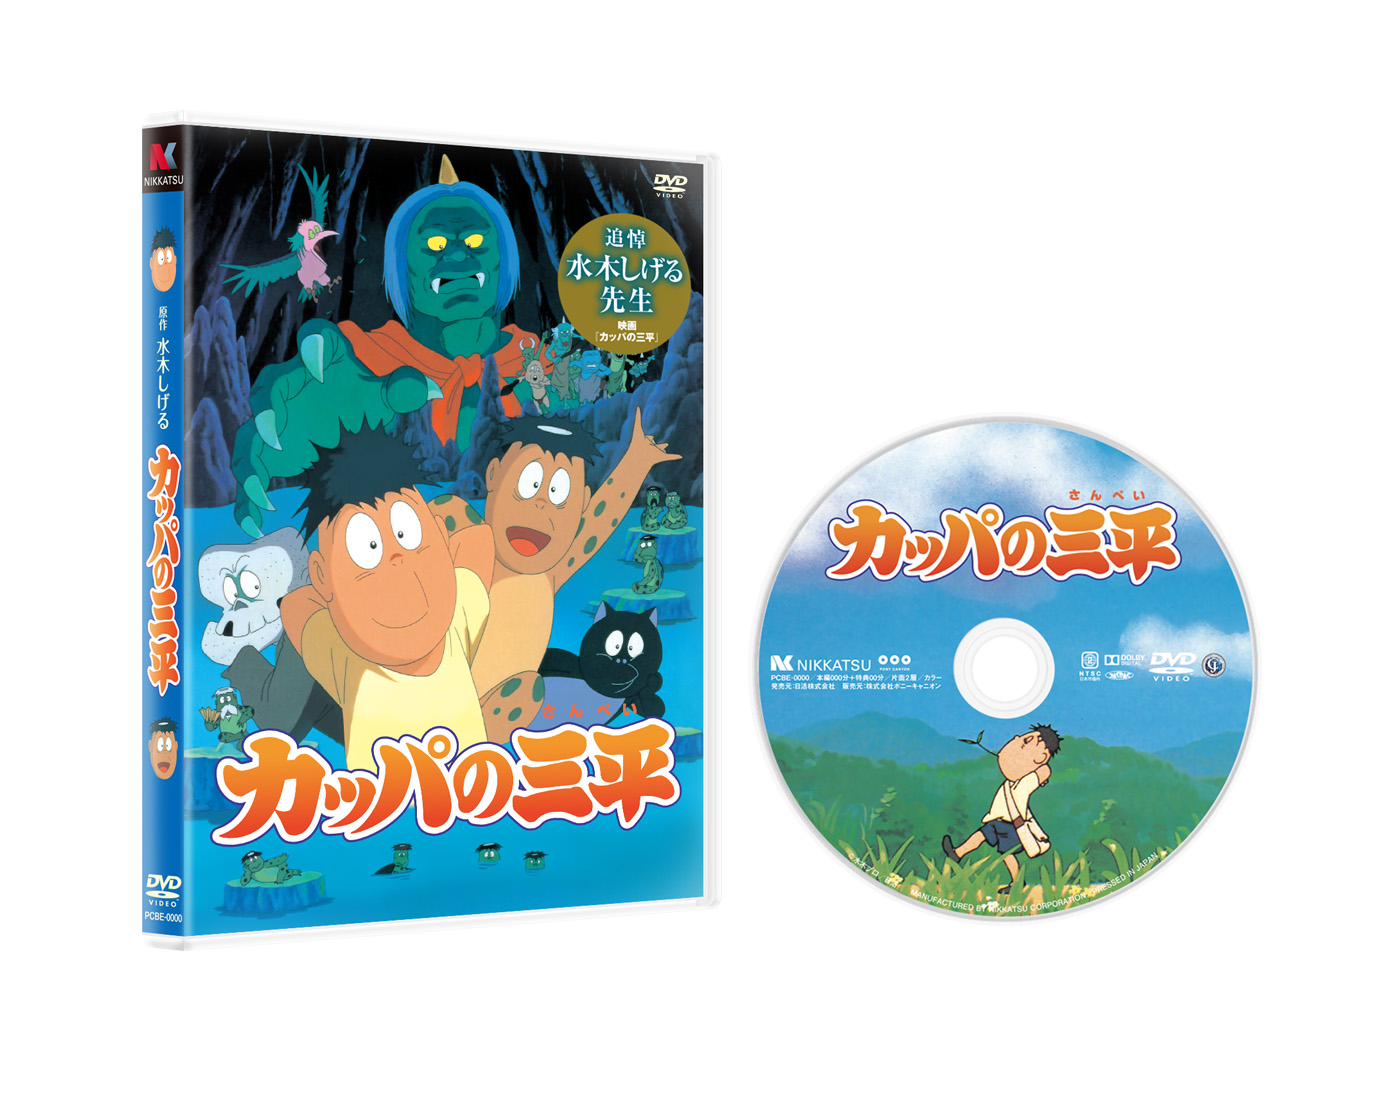 DVD カッパの三平通常版ジャケット